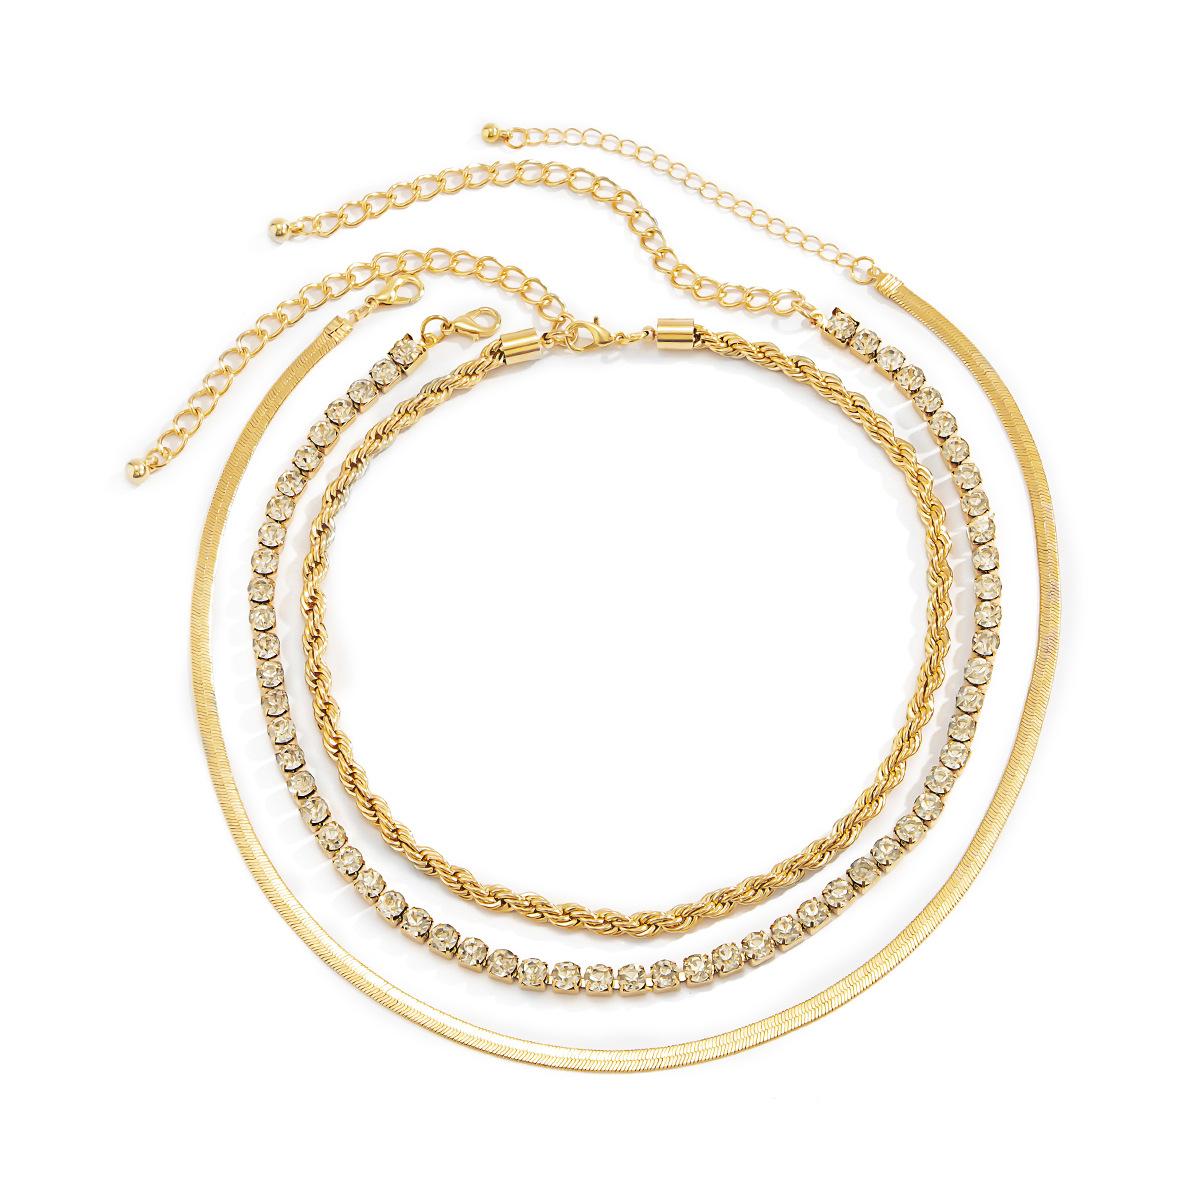 Lovely Casual Snakeskin Gold Multilayer Necklace